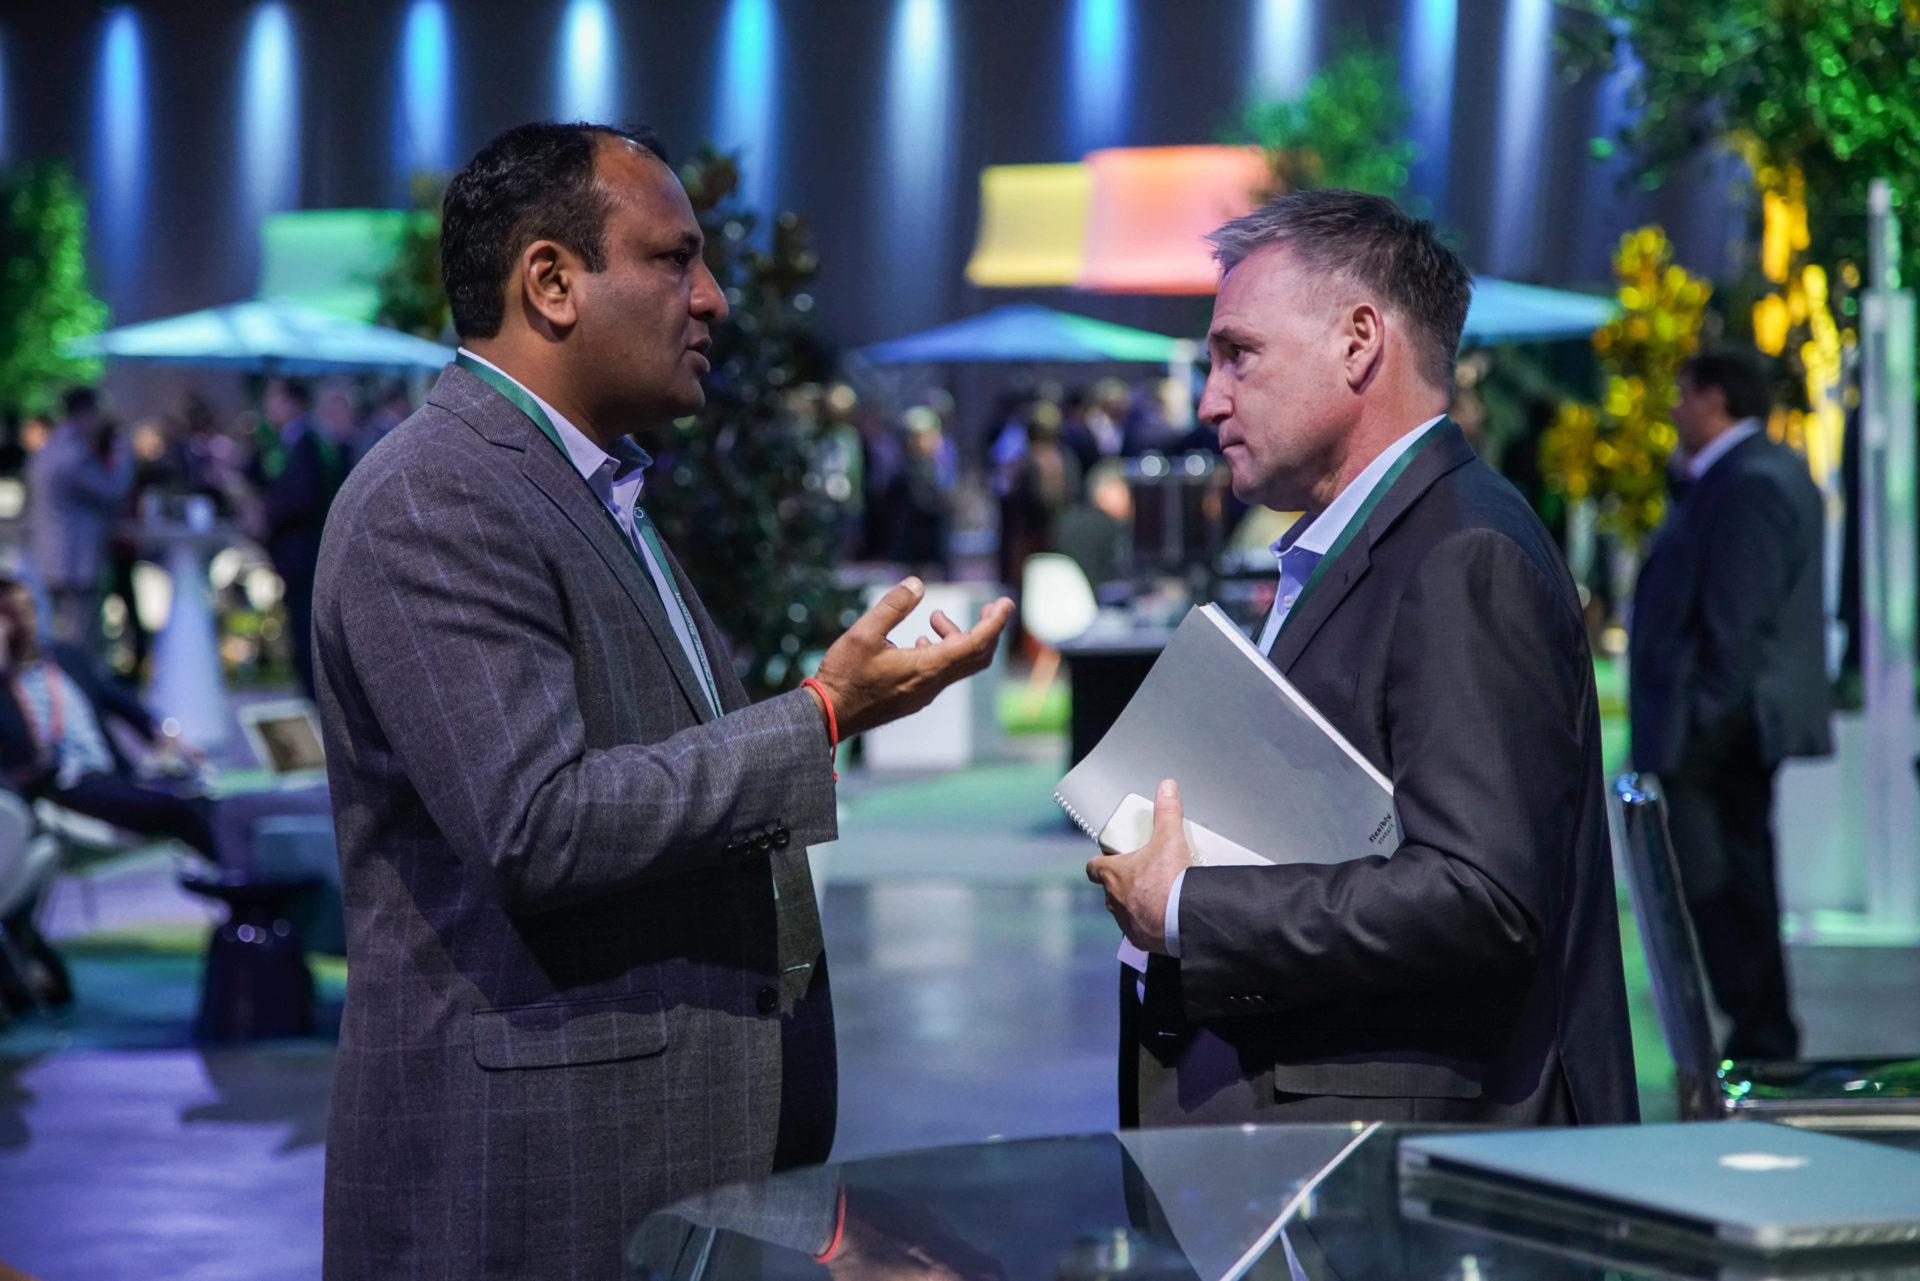 Cisco-PS17-Partner Hub-Engagement-00441.jpg